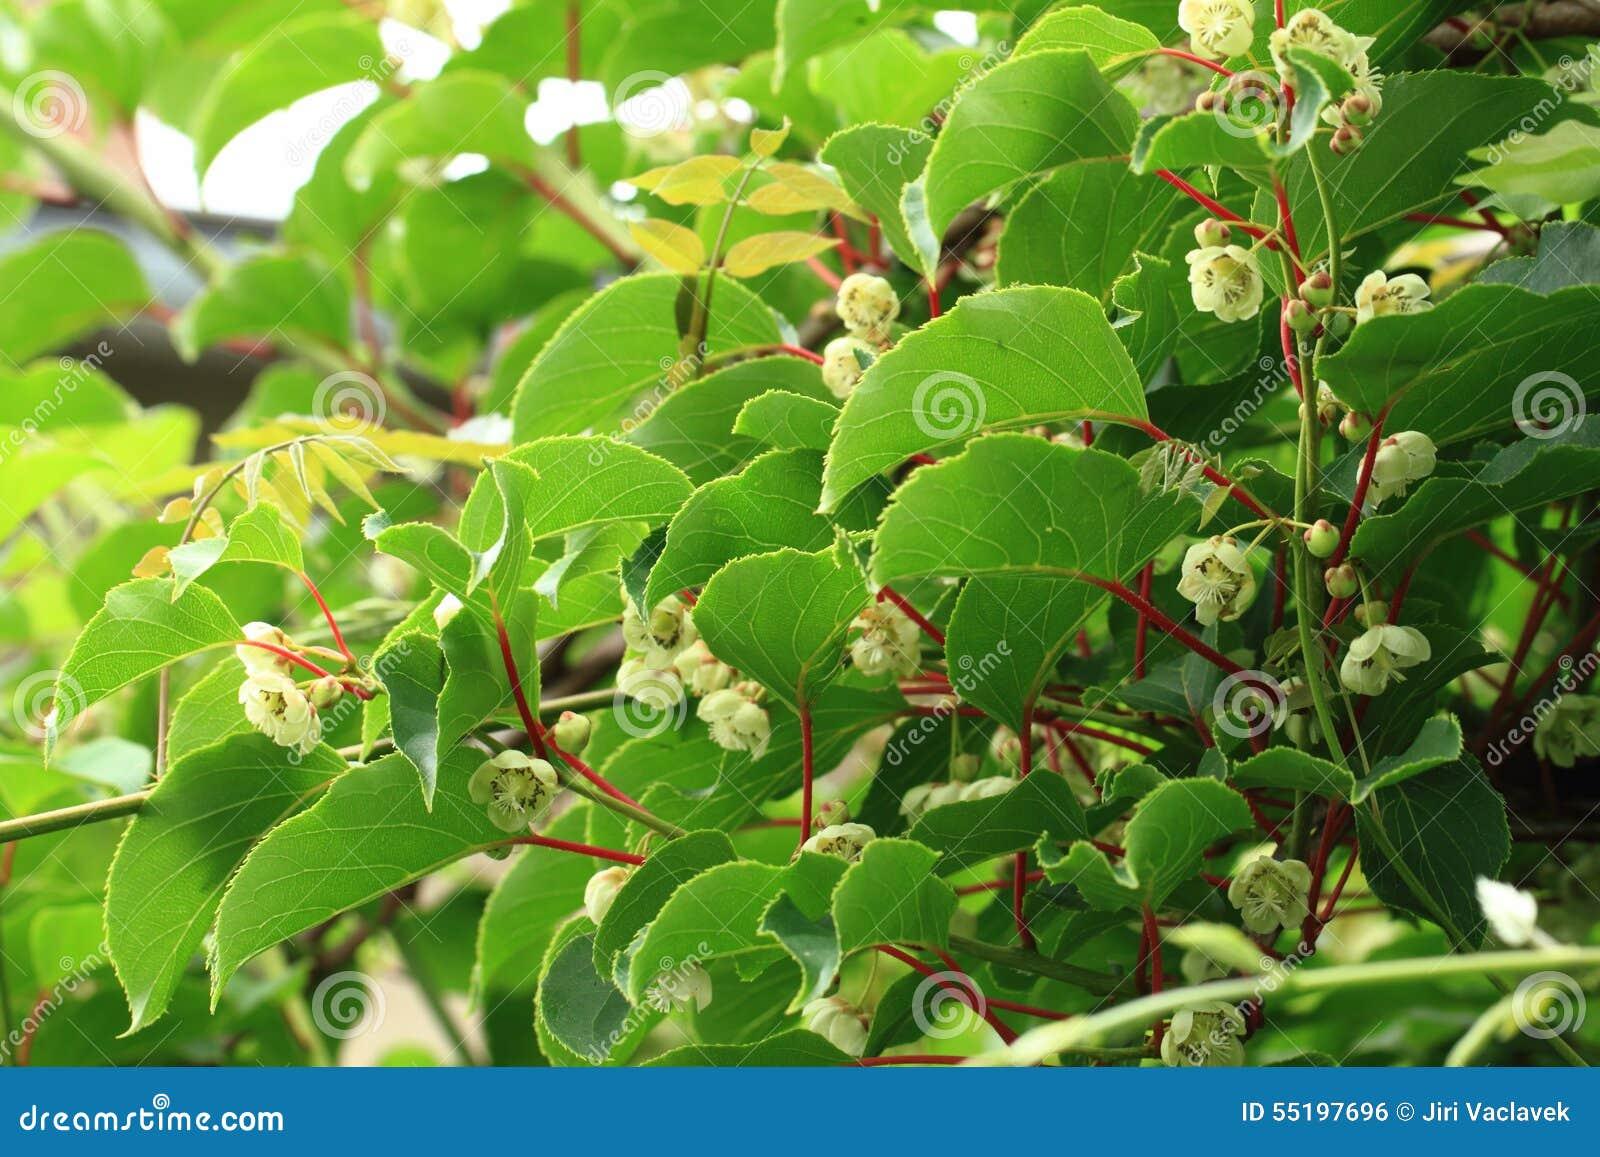 Fiori del kiwi e pianta actinidia fotografia stock for Kiwi pianta